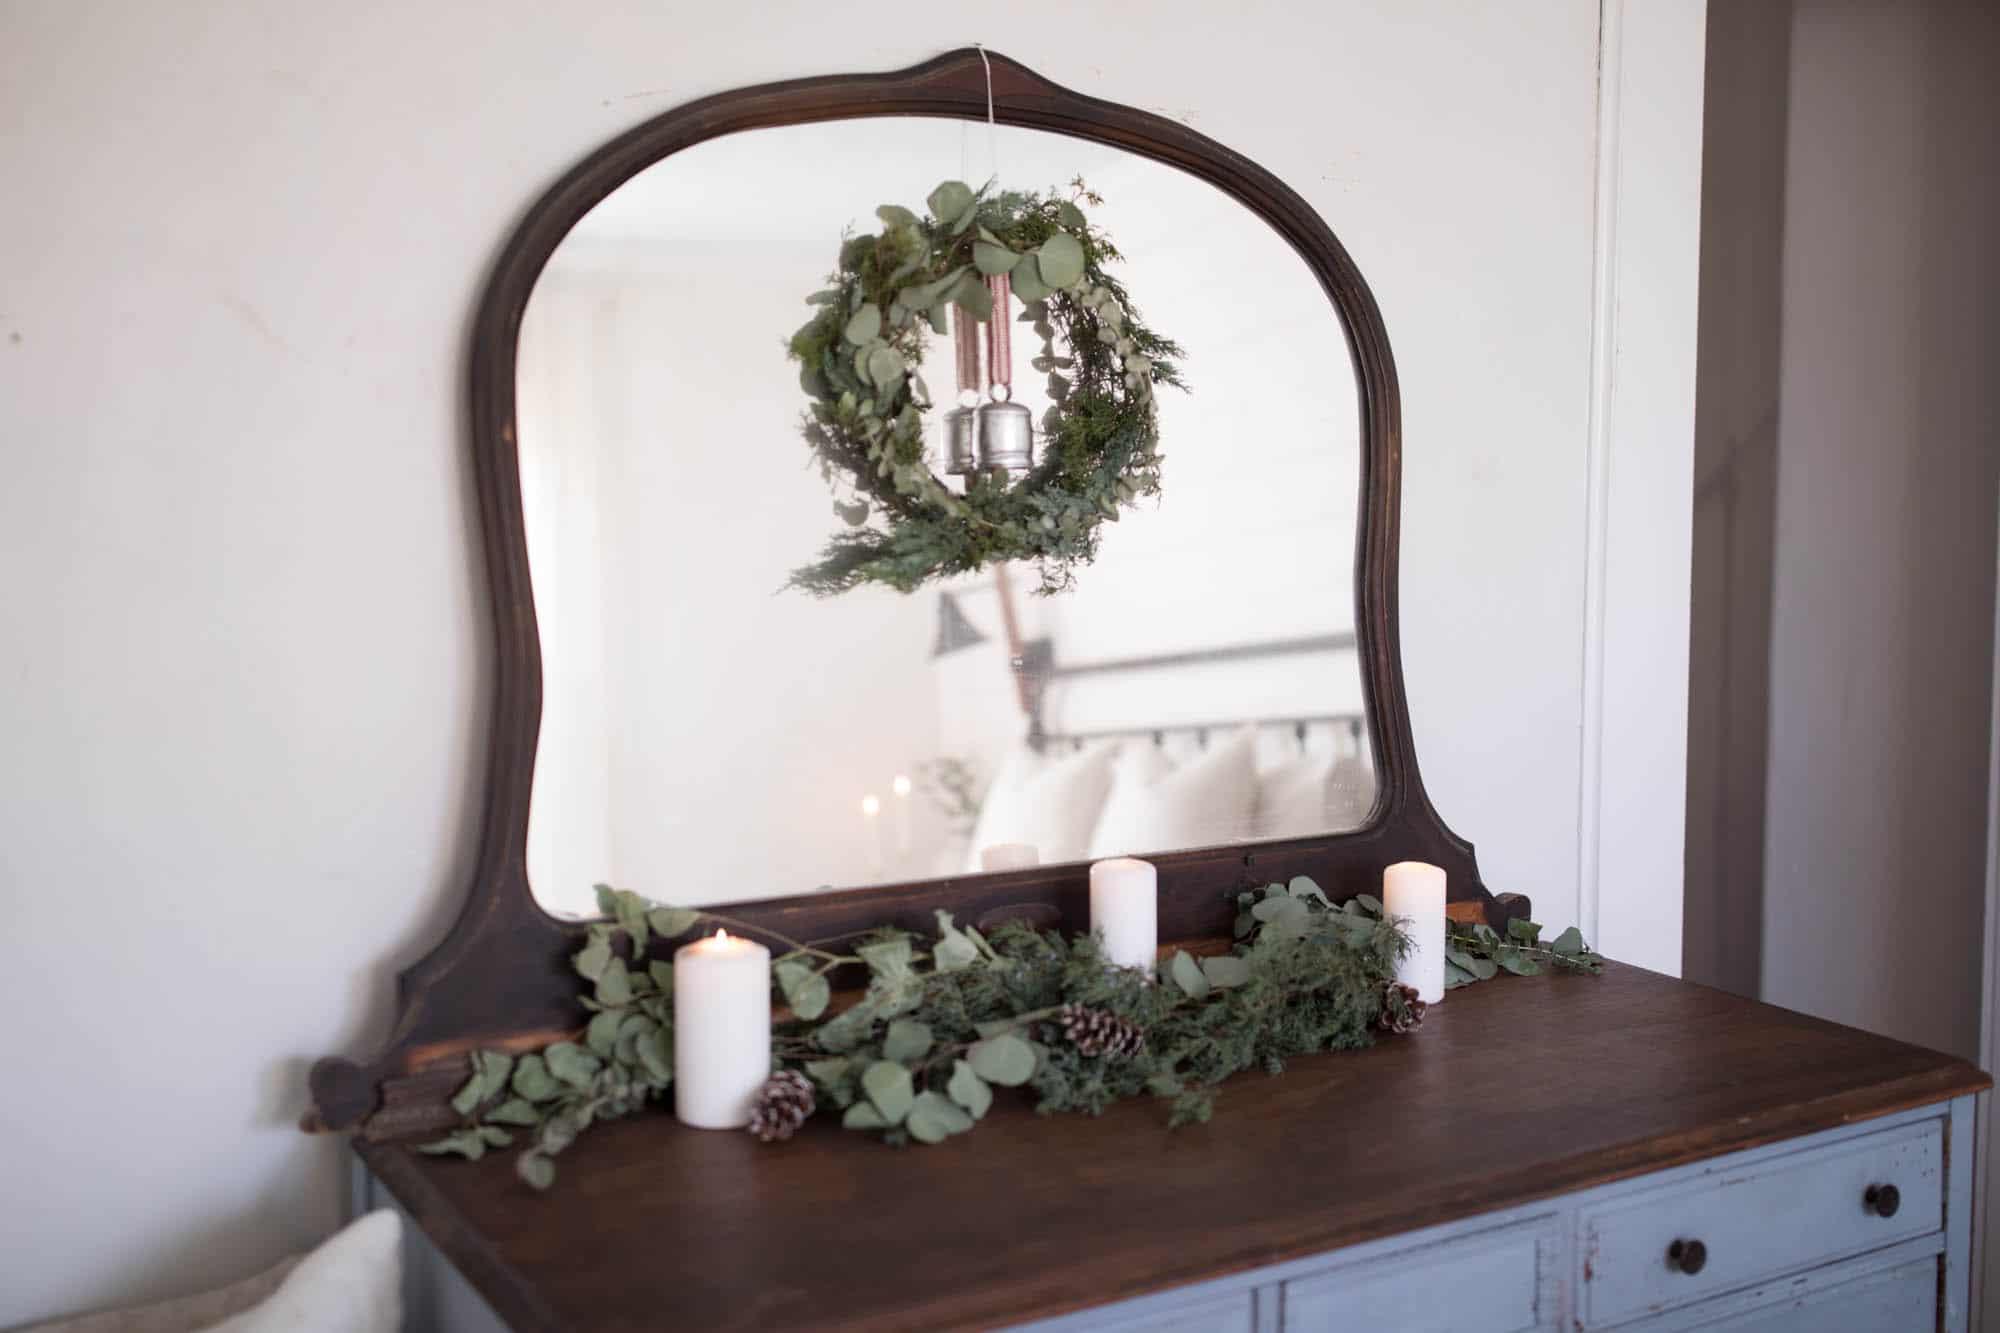 diy fresh greenery wreath natural christmas decorations farmhouse bedroom dresser decor